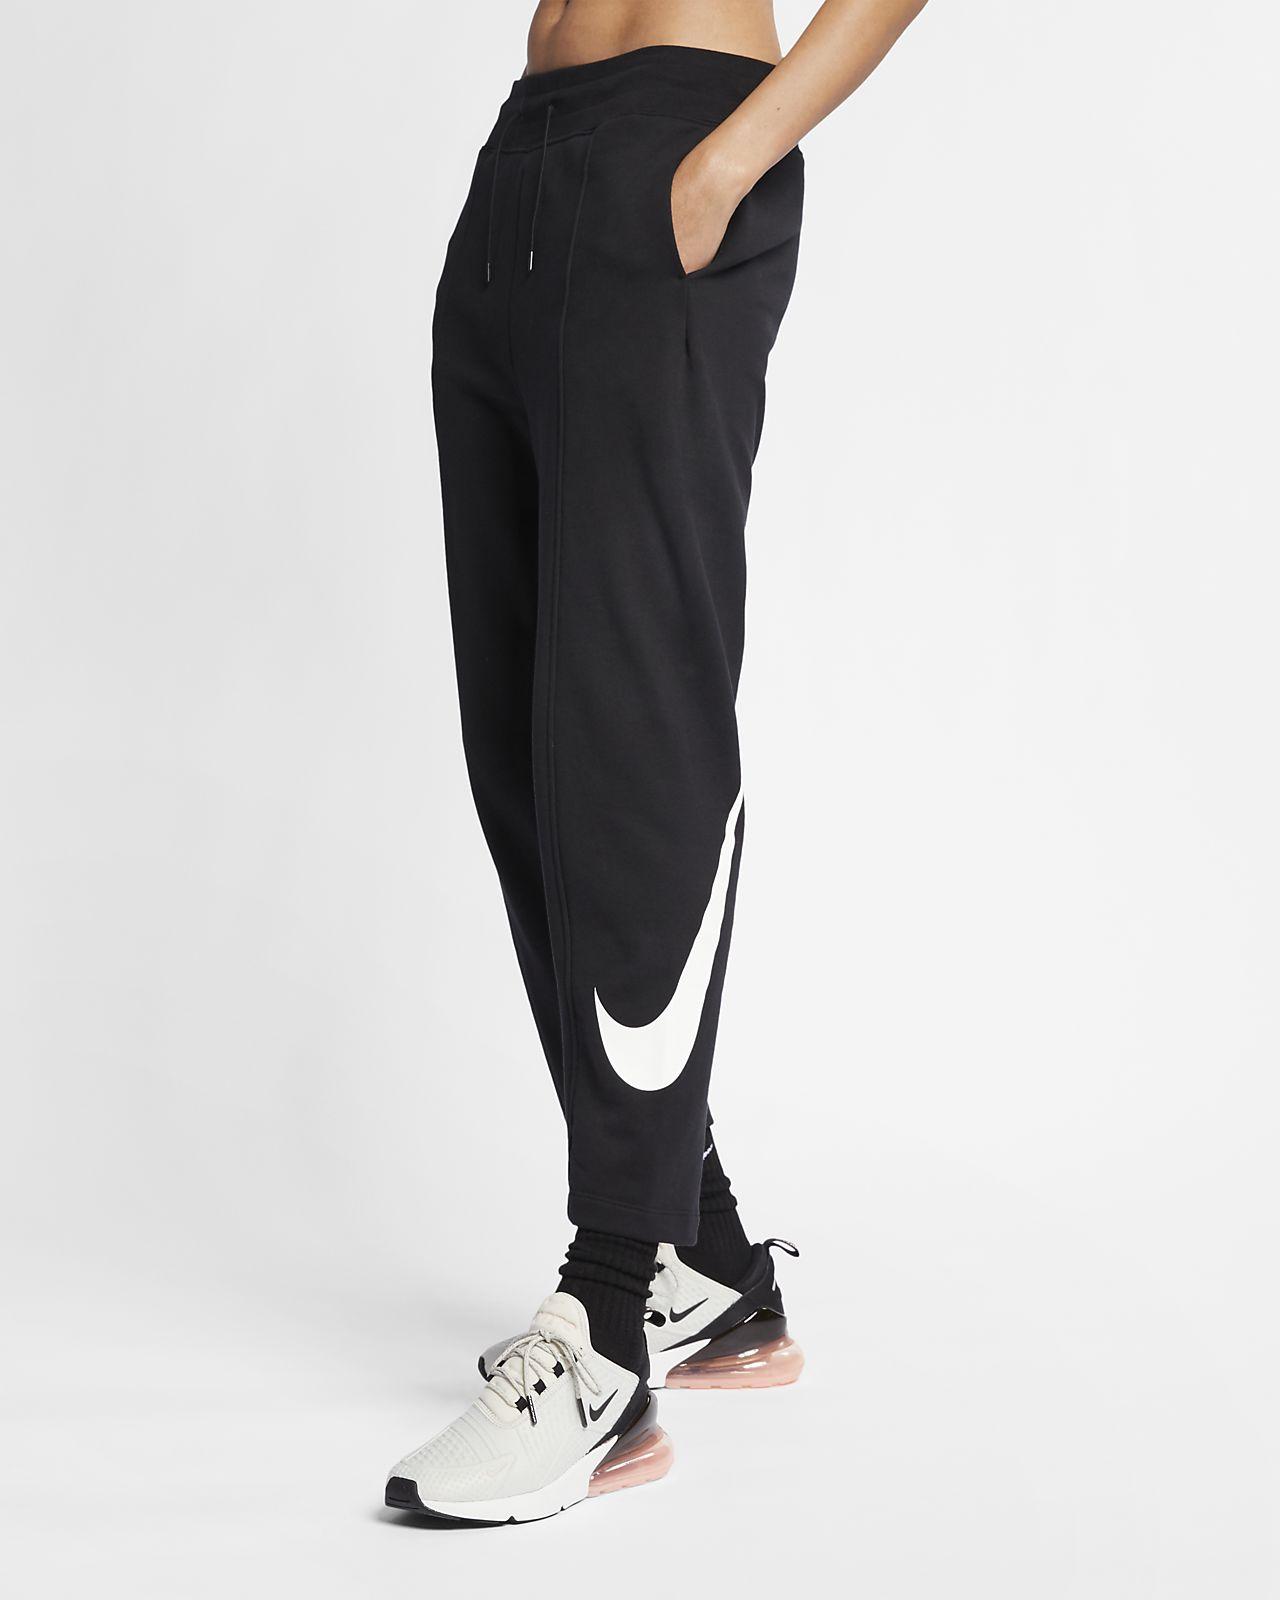 Nike Sportswear Swoosh 女款法國毛圈布運動褲